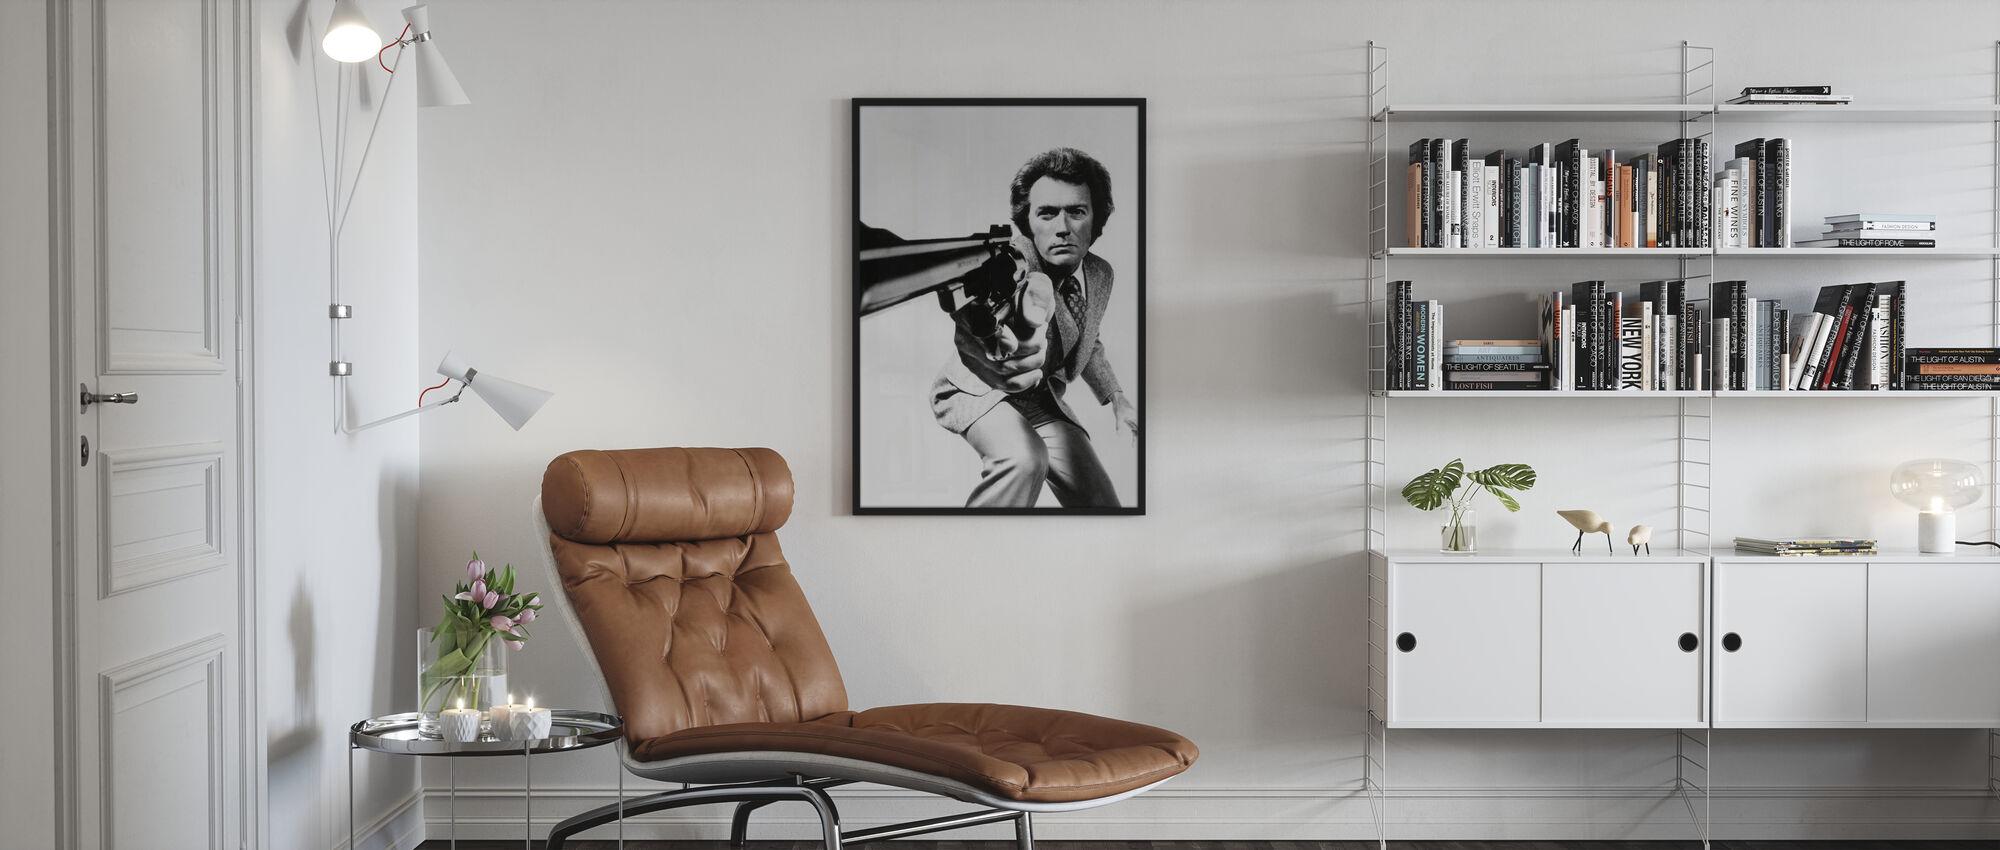 Clint Eastwood in Magnum Force - Framed print - Living Room